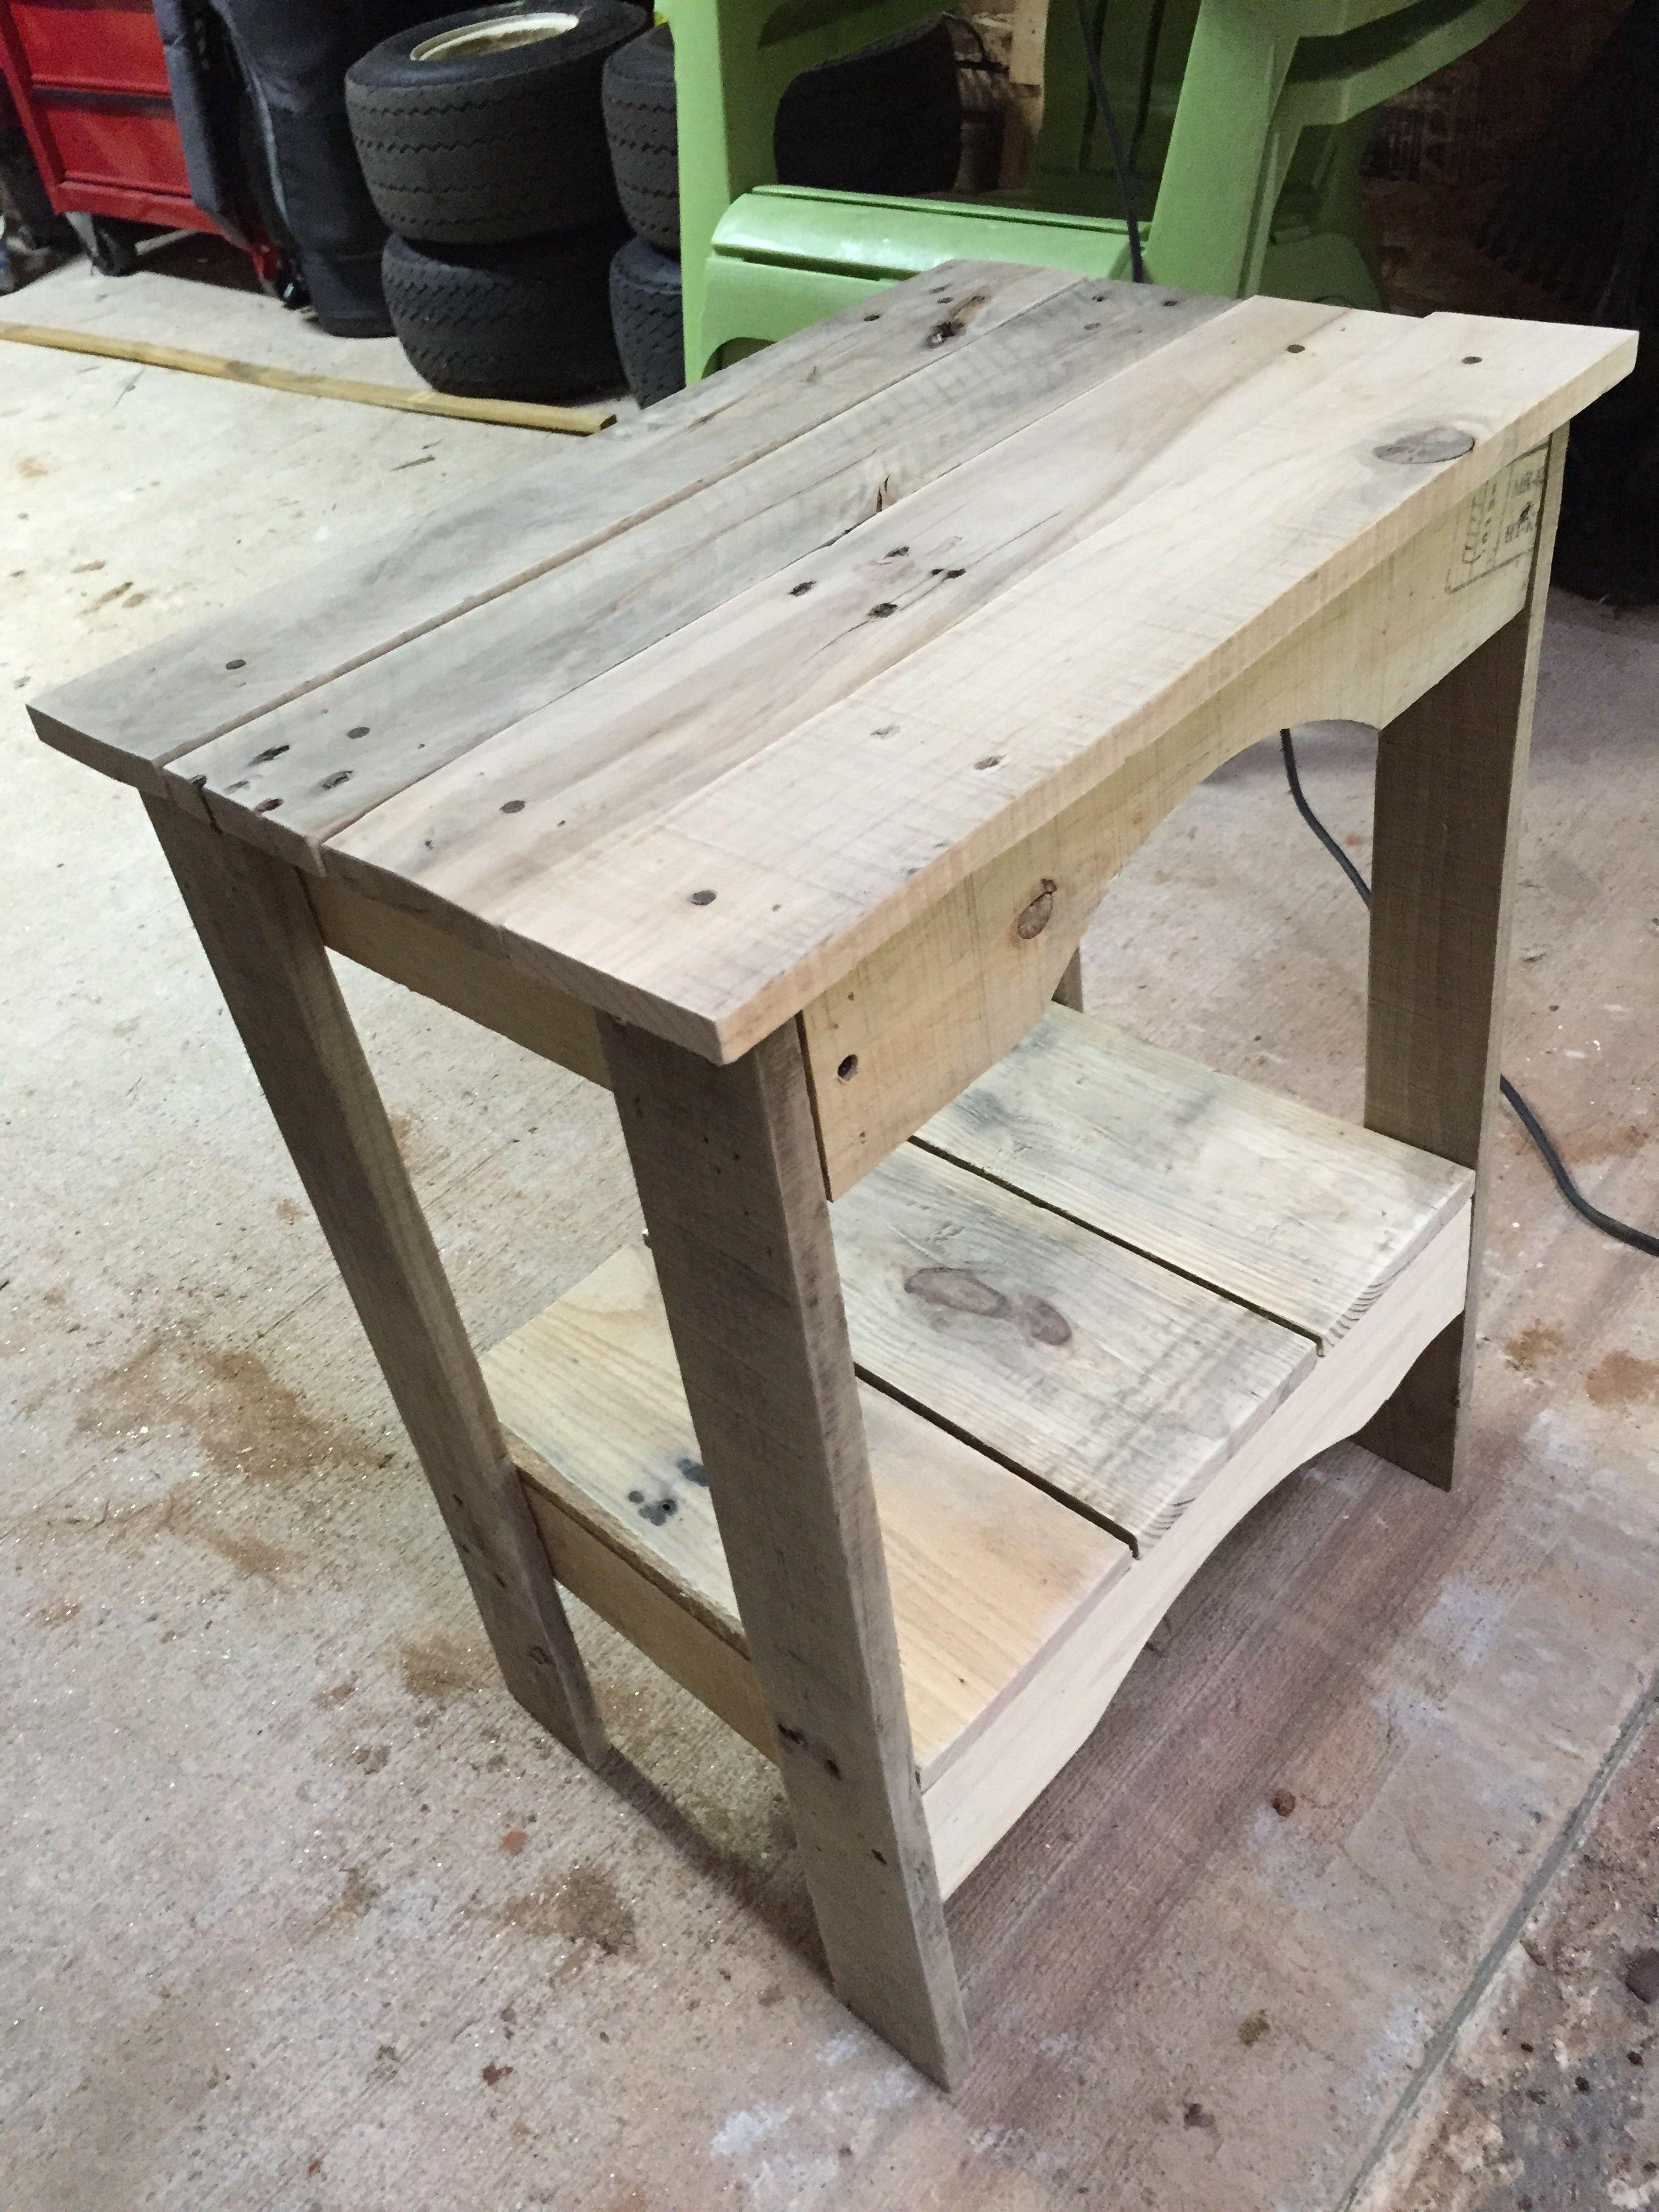 Ksg Pallet Wood End Table Wooden Pallet Furniture Wood Diy Wood Pallet Projects